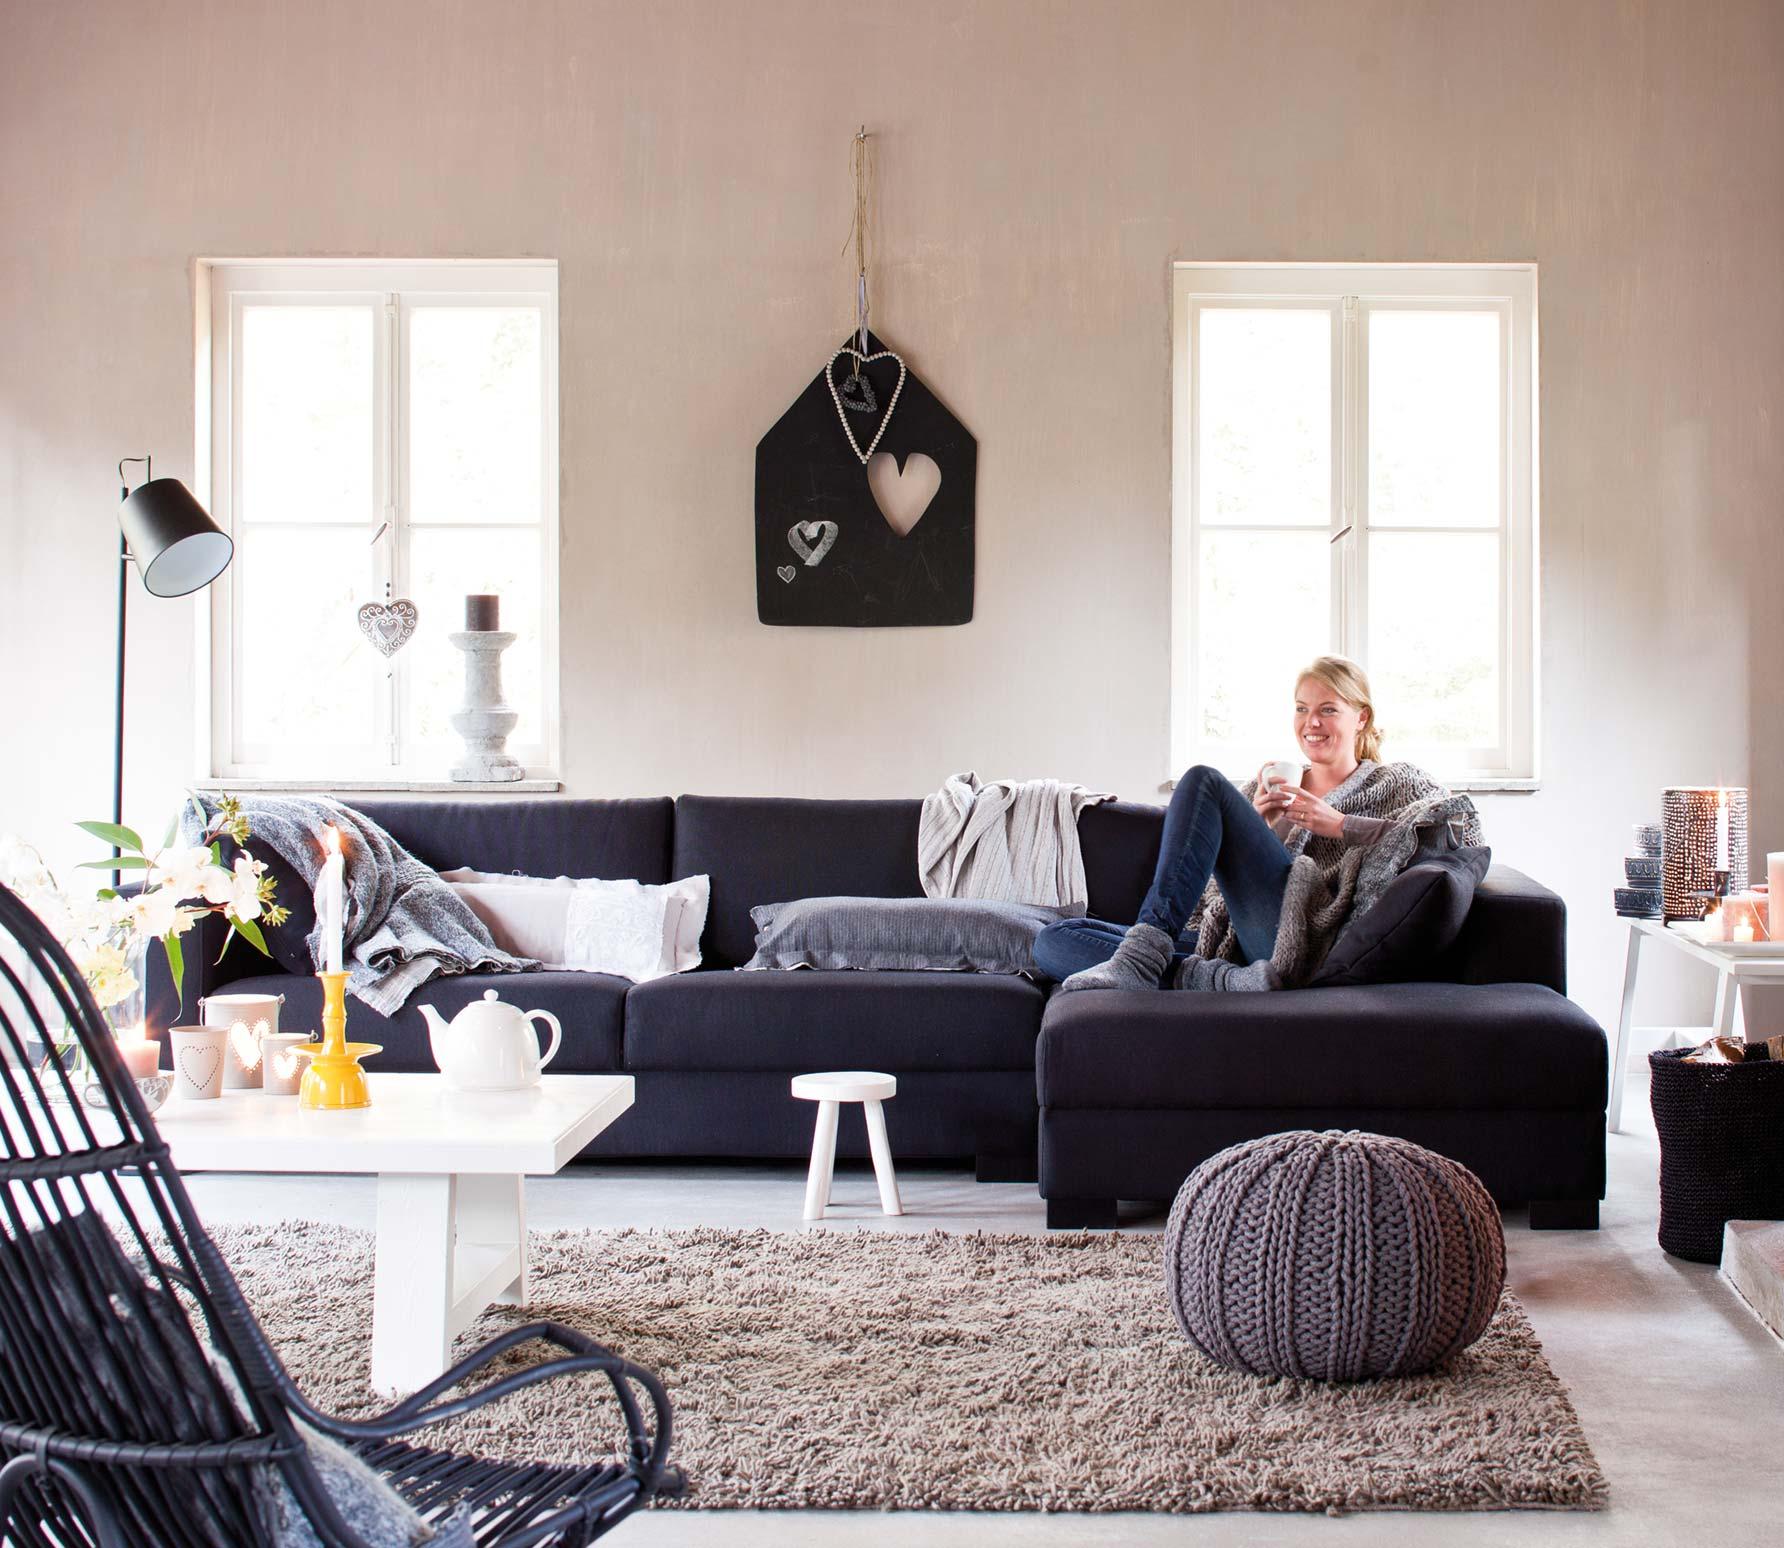 Jurre denfa hoekbank rechts diverse kleuren denfa zwart 29 - Zwarte bank lounge ...